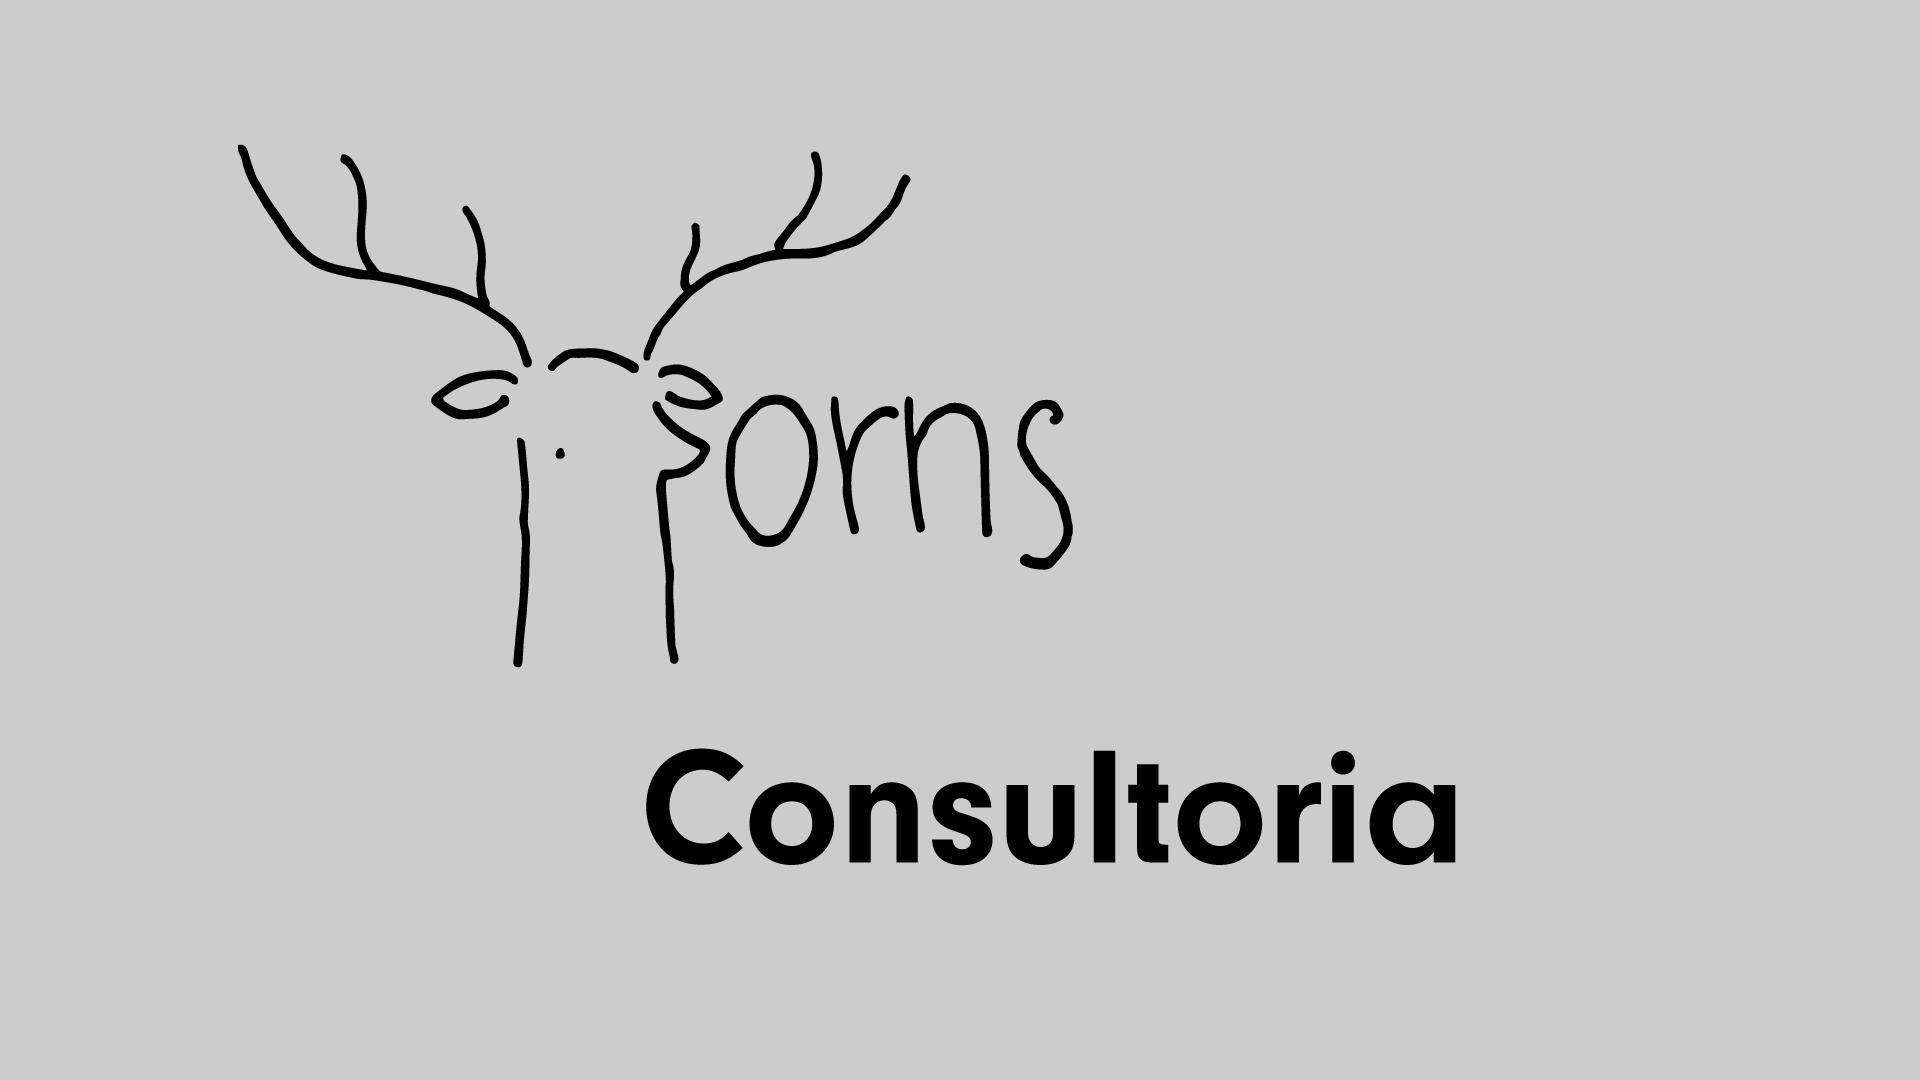 Proyecto de diseño Horns Consultoria